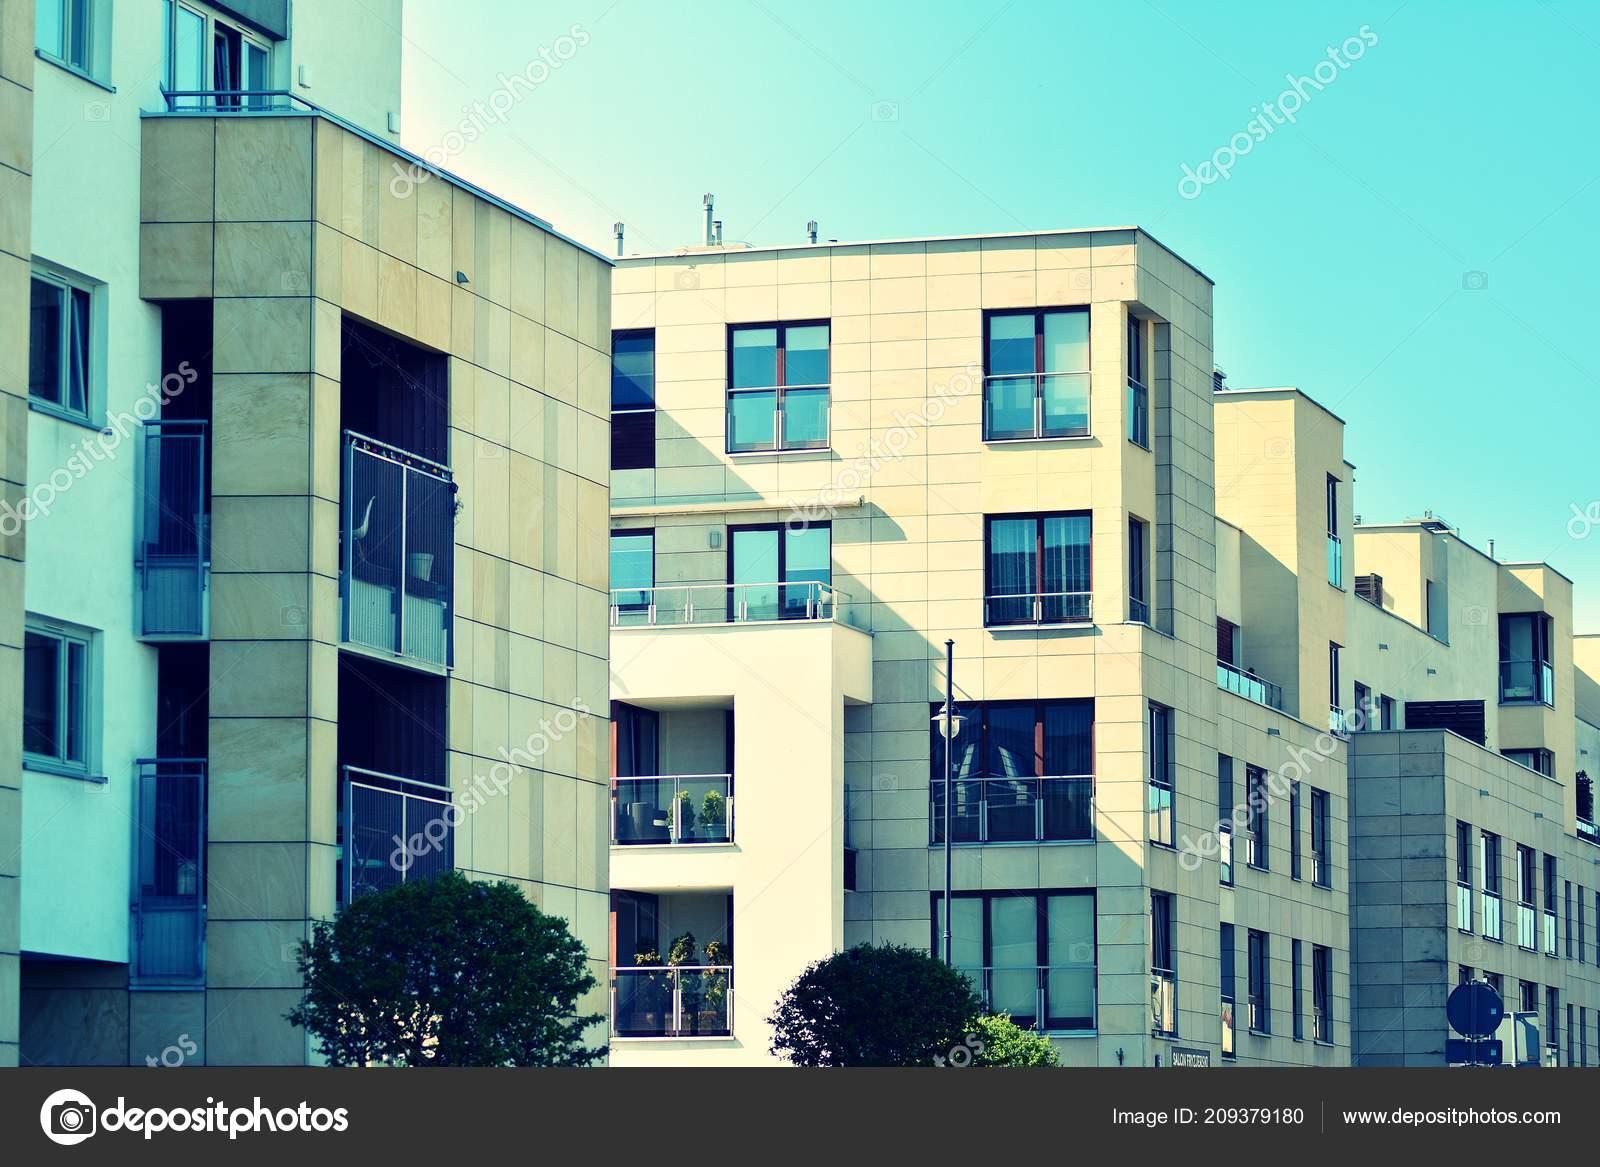 Modern Apartment Building Exterior Retro Colors Stylization Stock Photo